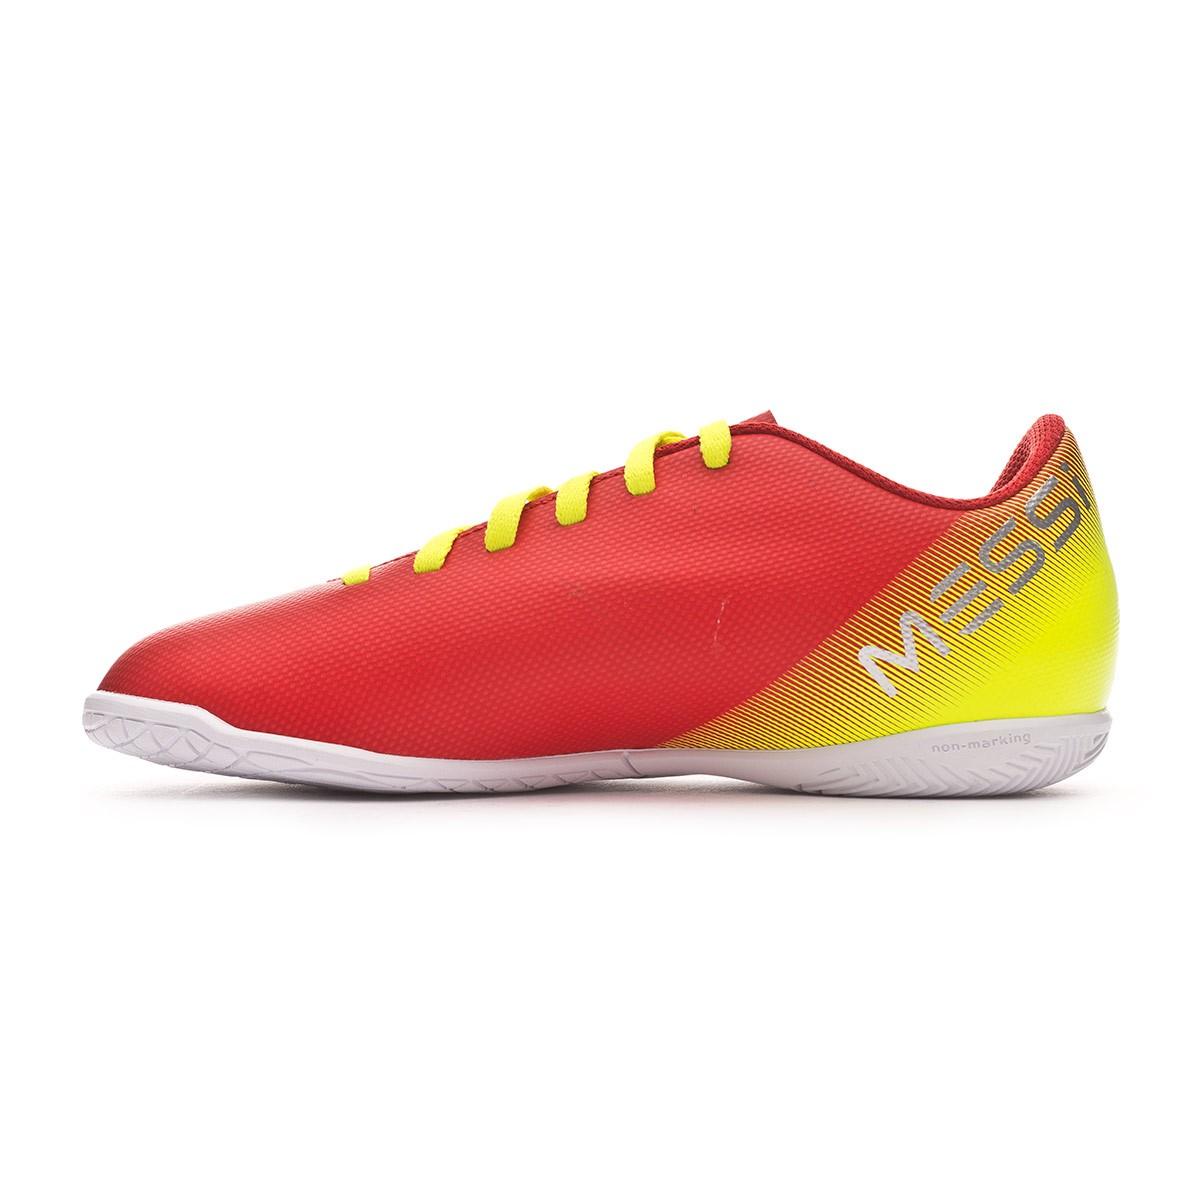 ab9bfbb161af5 Tenis adidas Nemeziz Messi Tango 18.4 IN Niño Active  red-Silberfoil-Football blue - Tienda de fútbol Fútbol Emotion